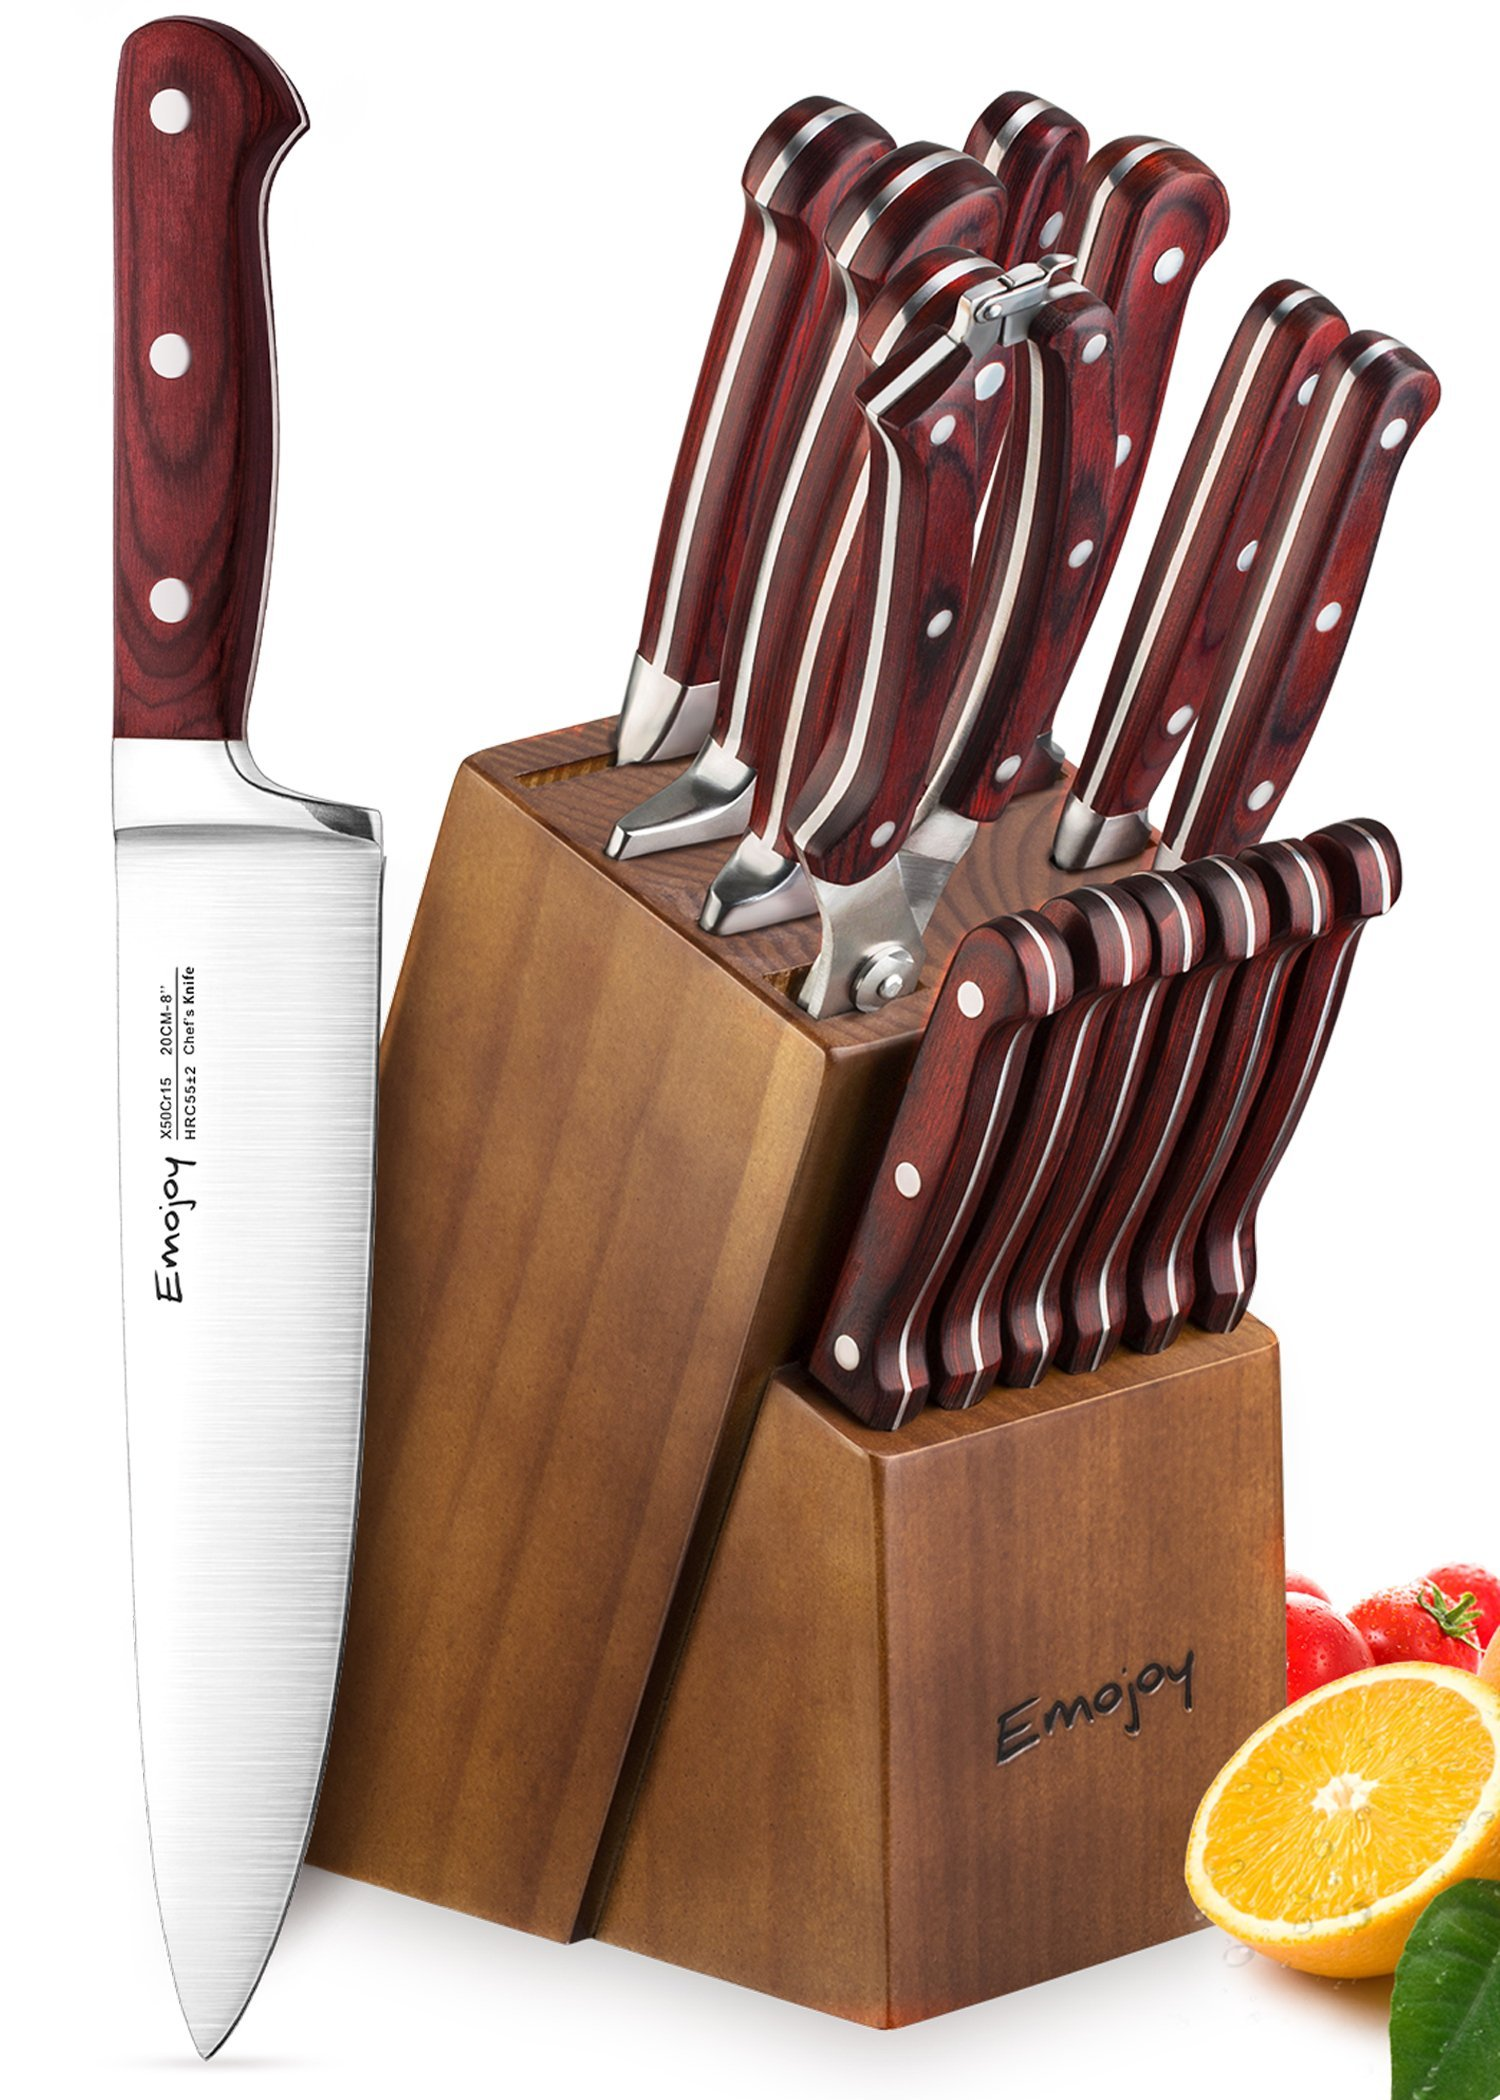 Knife Set, 15-Piece Kitchen Knife Set with Block Wooden, Self Sharpening Manual for Chef Knife Set, German Stainless Steel, Emojoy